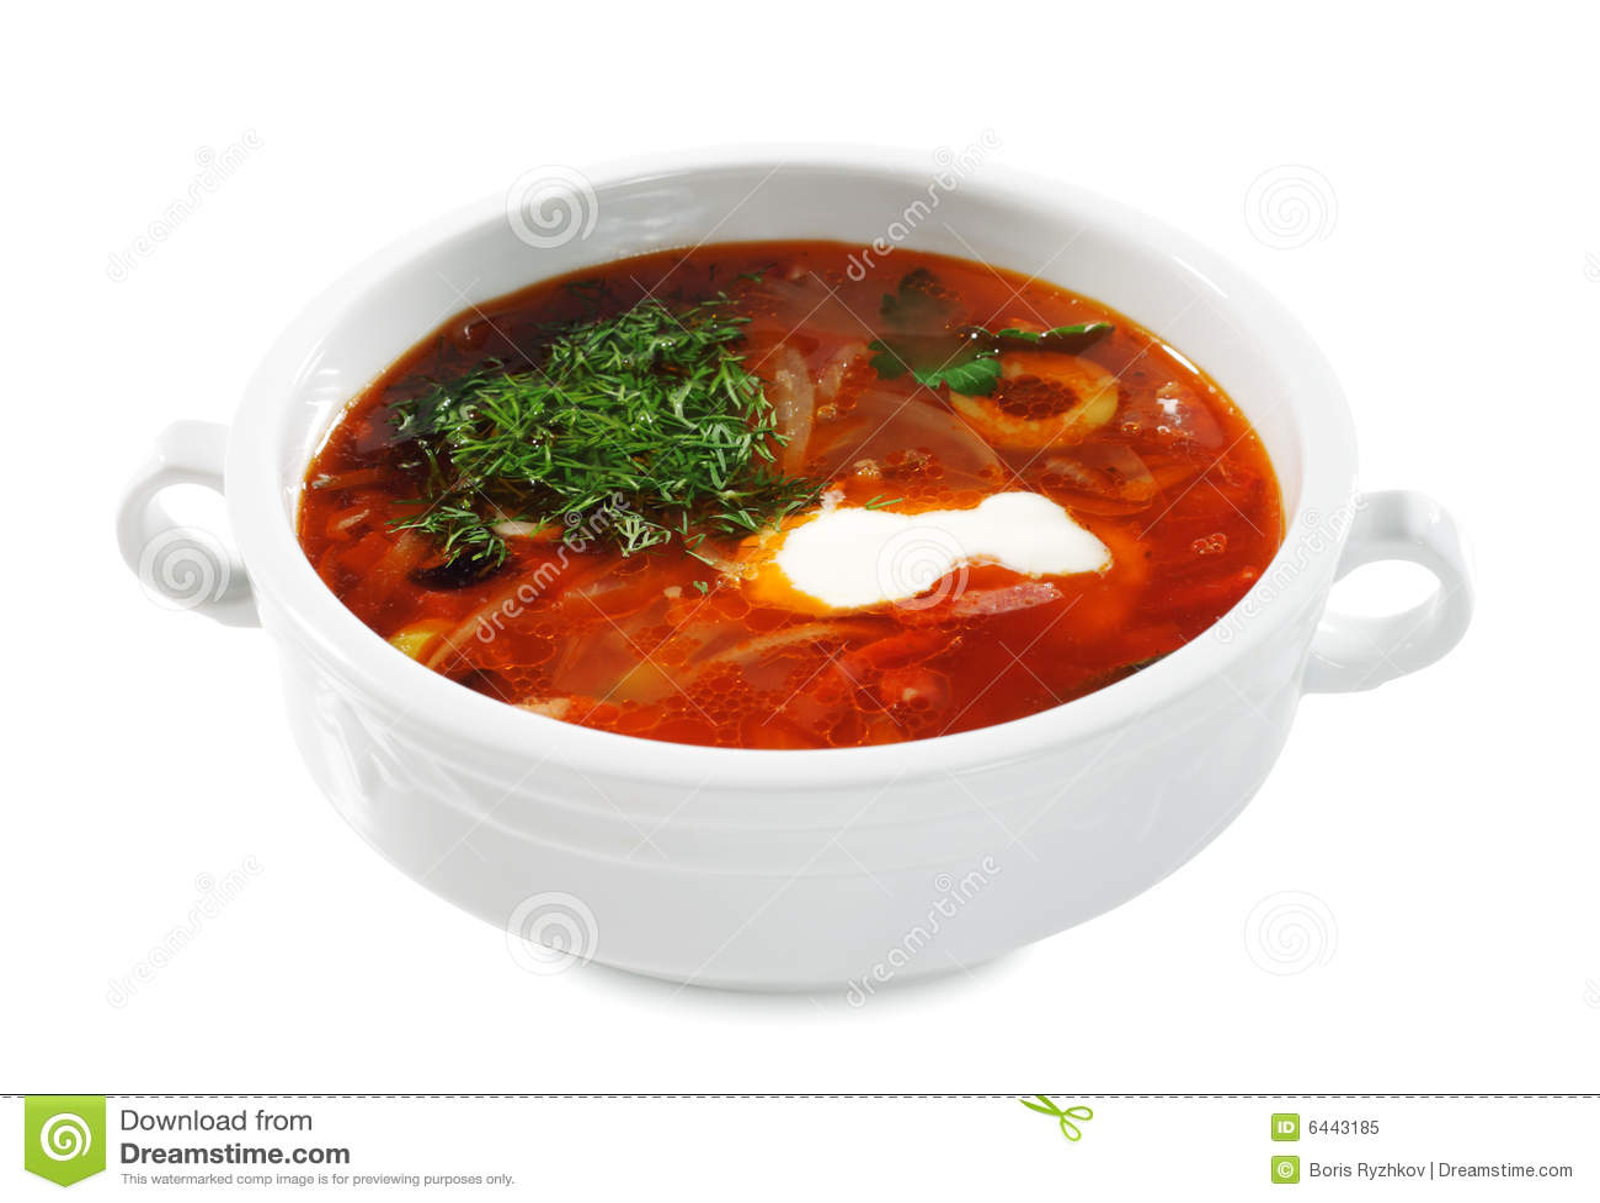 Cucina russa ed ucraina minestra solyanka fotografia for Cucina russa